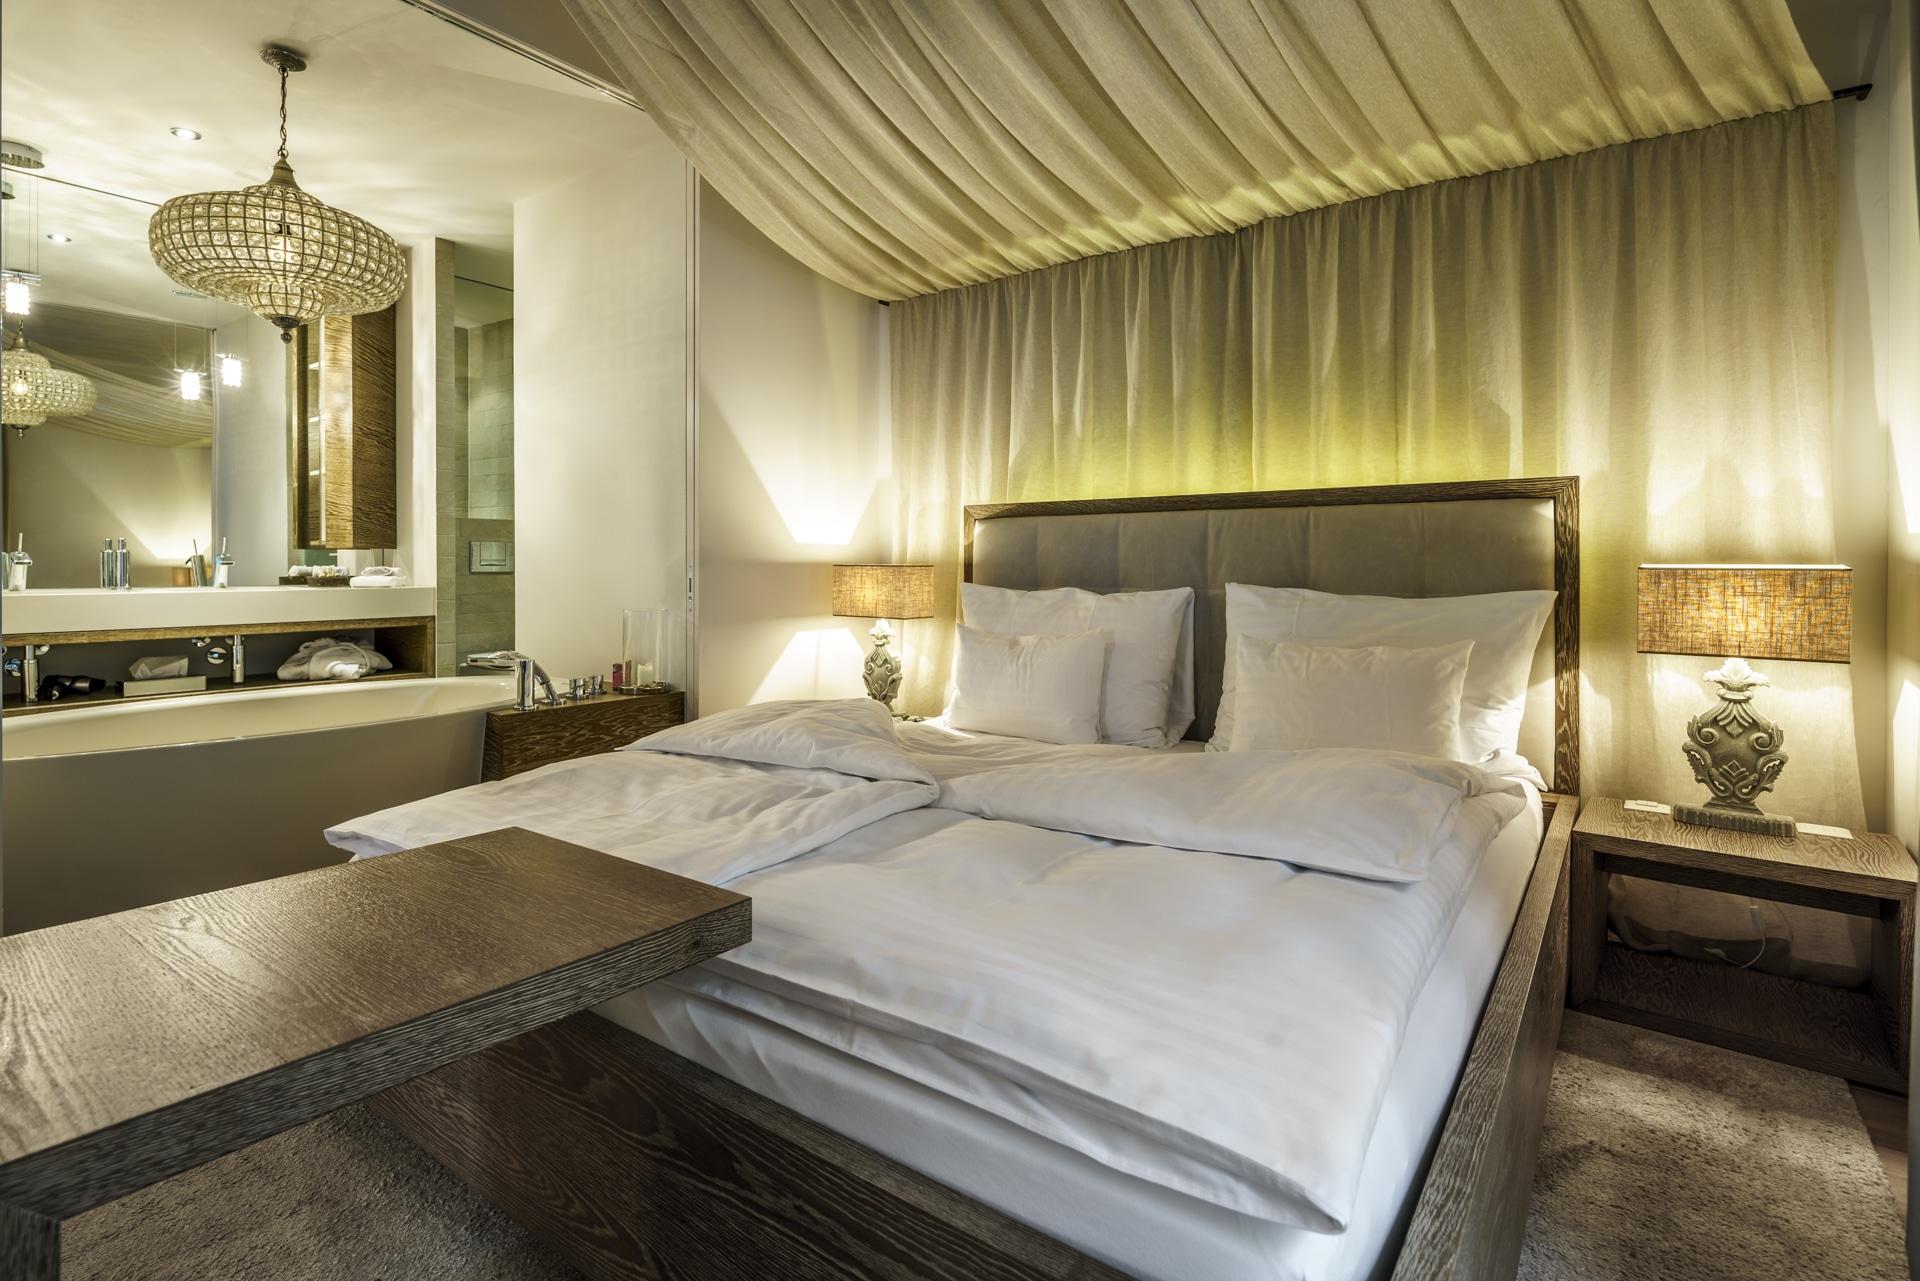 Premium Suite Charming Hotel Bad Bubendorf Ansicht 2